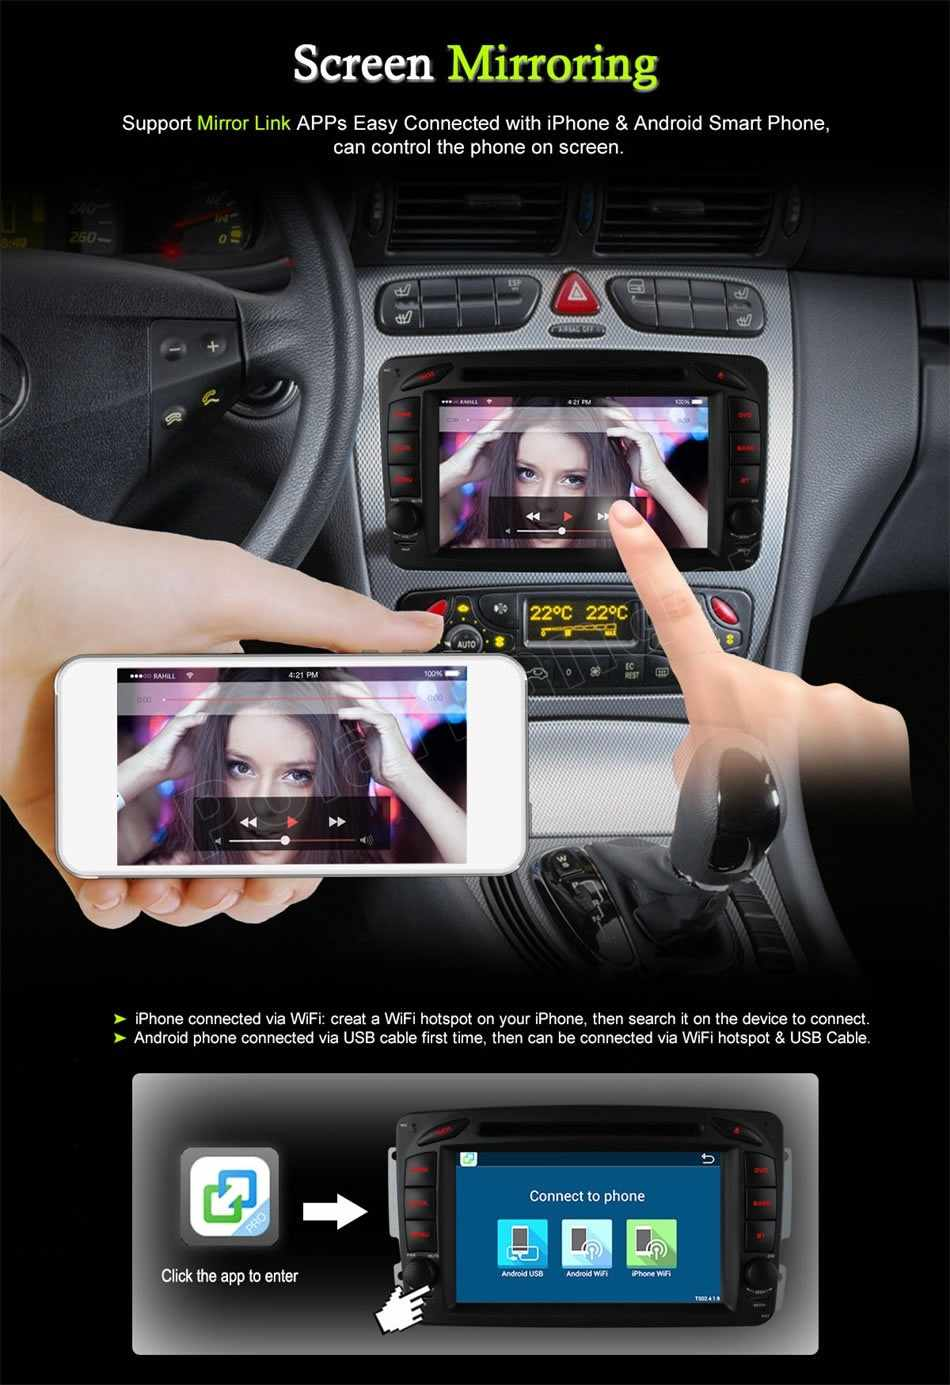 For Me/rcedes B-ENZ C/LK W209 W203 W168 W208 W463 W170 Vaneo Viano Vito E210 C208 Radio Car DVD Player Stereo Bluetooth